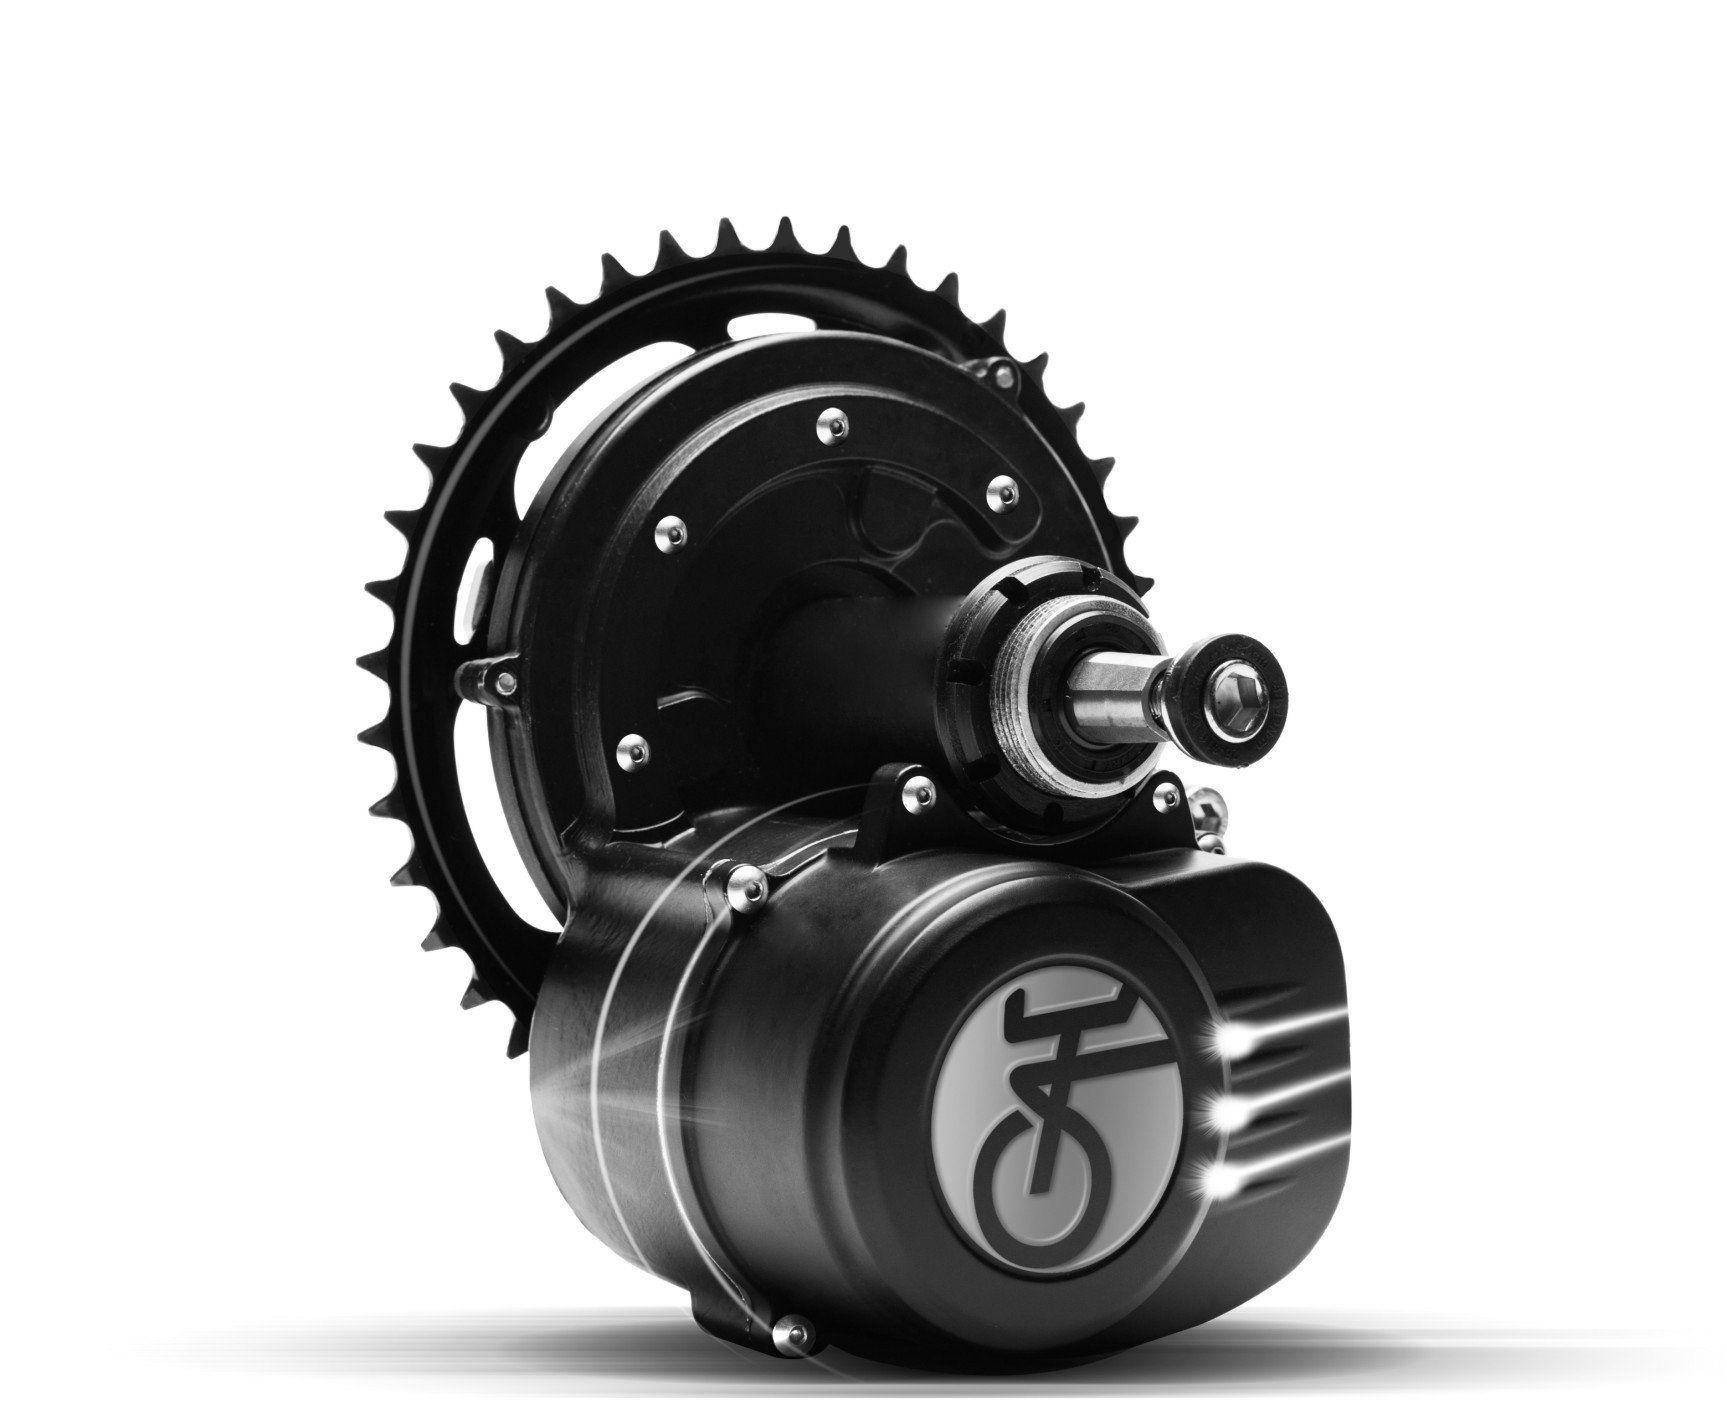 Tongsheng Tsdz2b Torque Sensored Diy Ebike Mid Motor Bicicleta